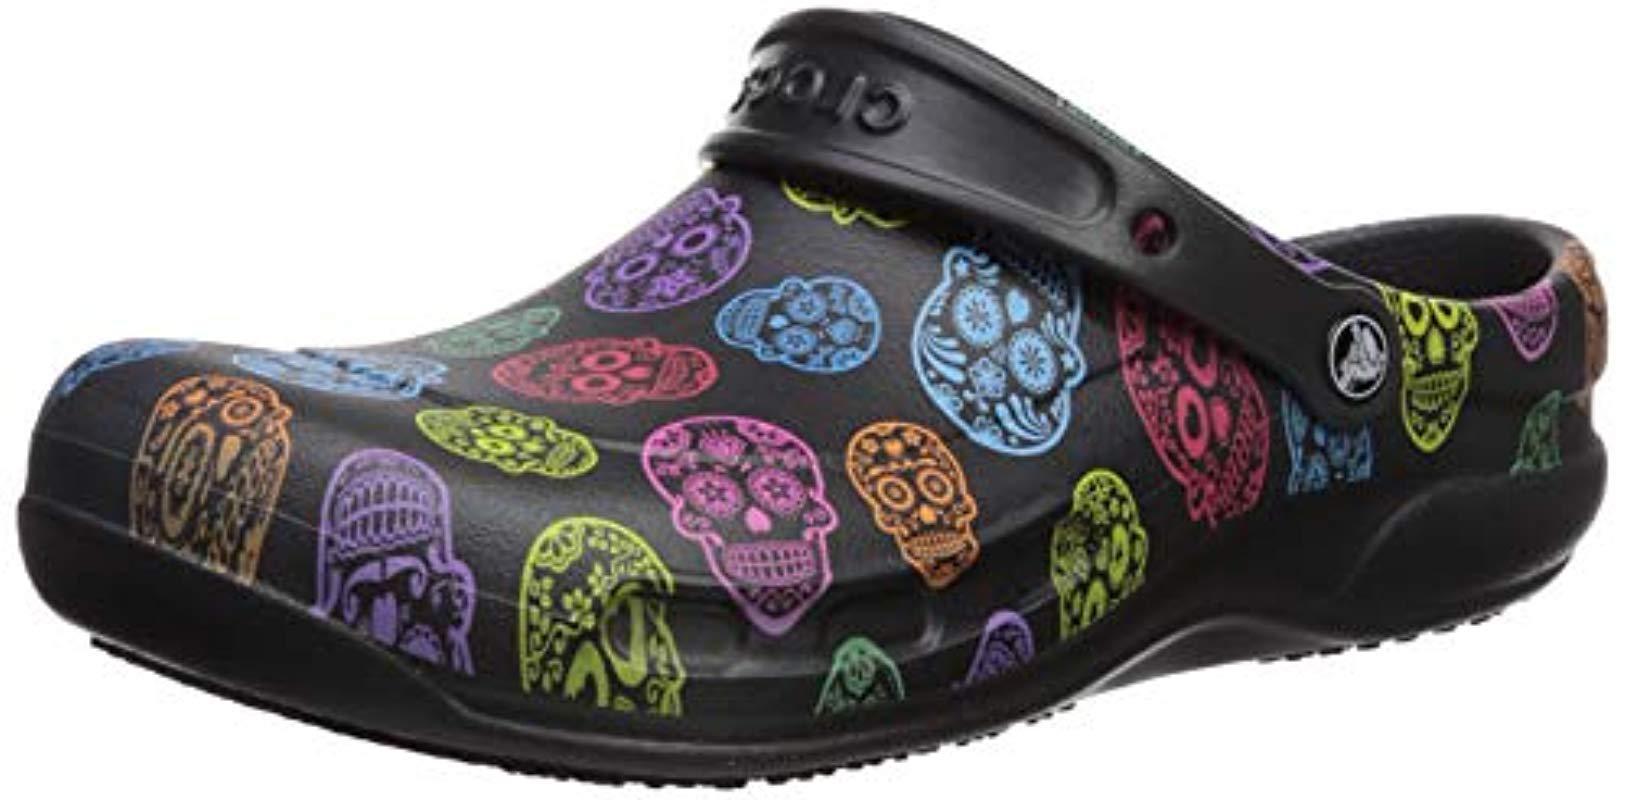 32d35e0f40f63f Crocs™. Women s Black And Bistro Graphic Clog ...